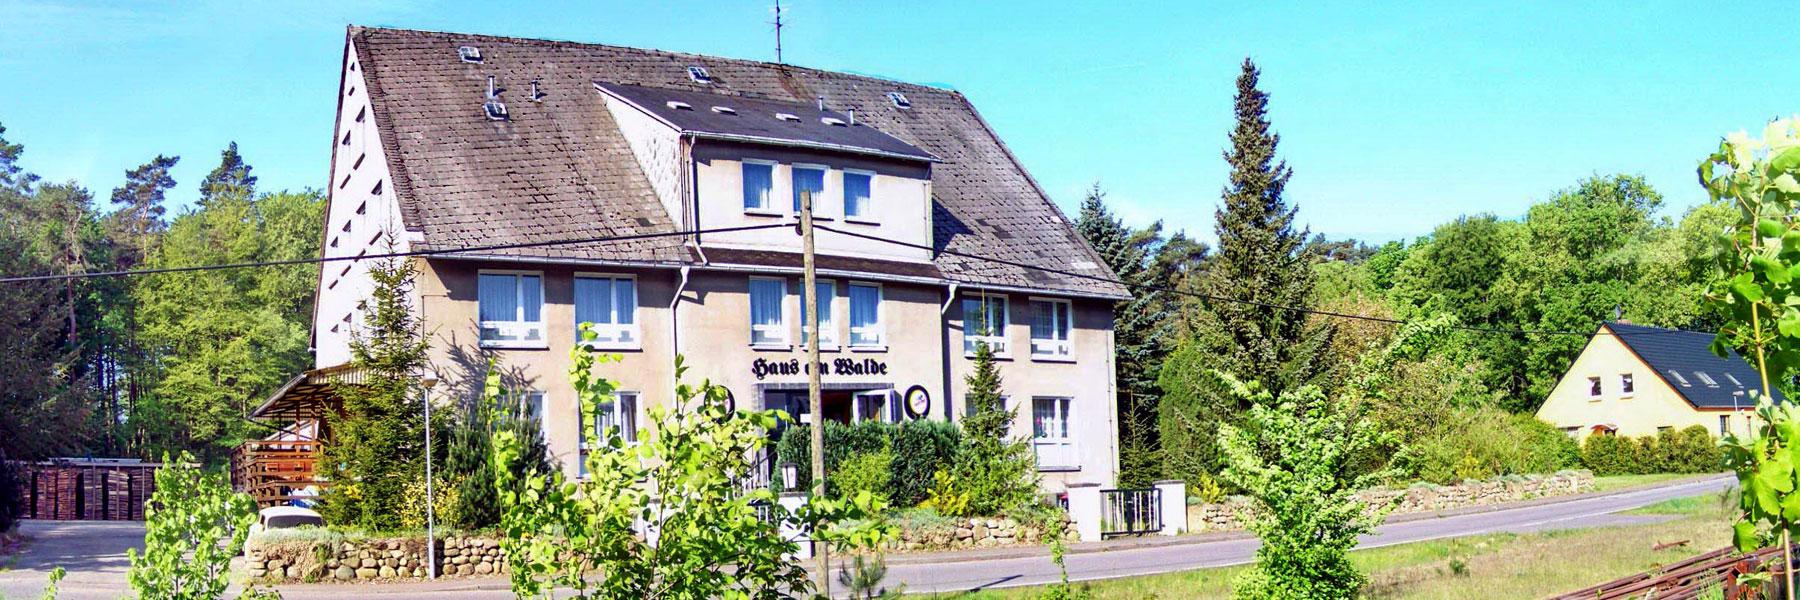 "Gruppenhaus ""Haus am Walde"" bei Dabel"